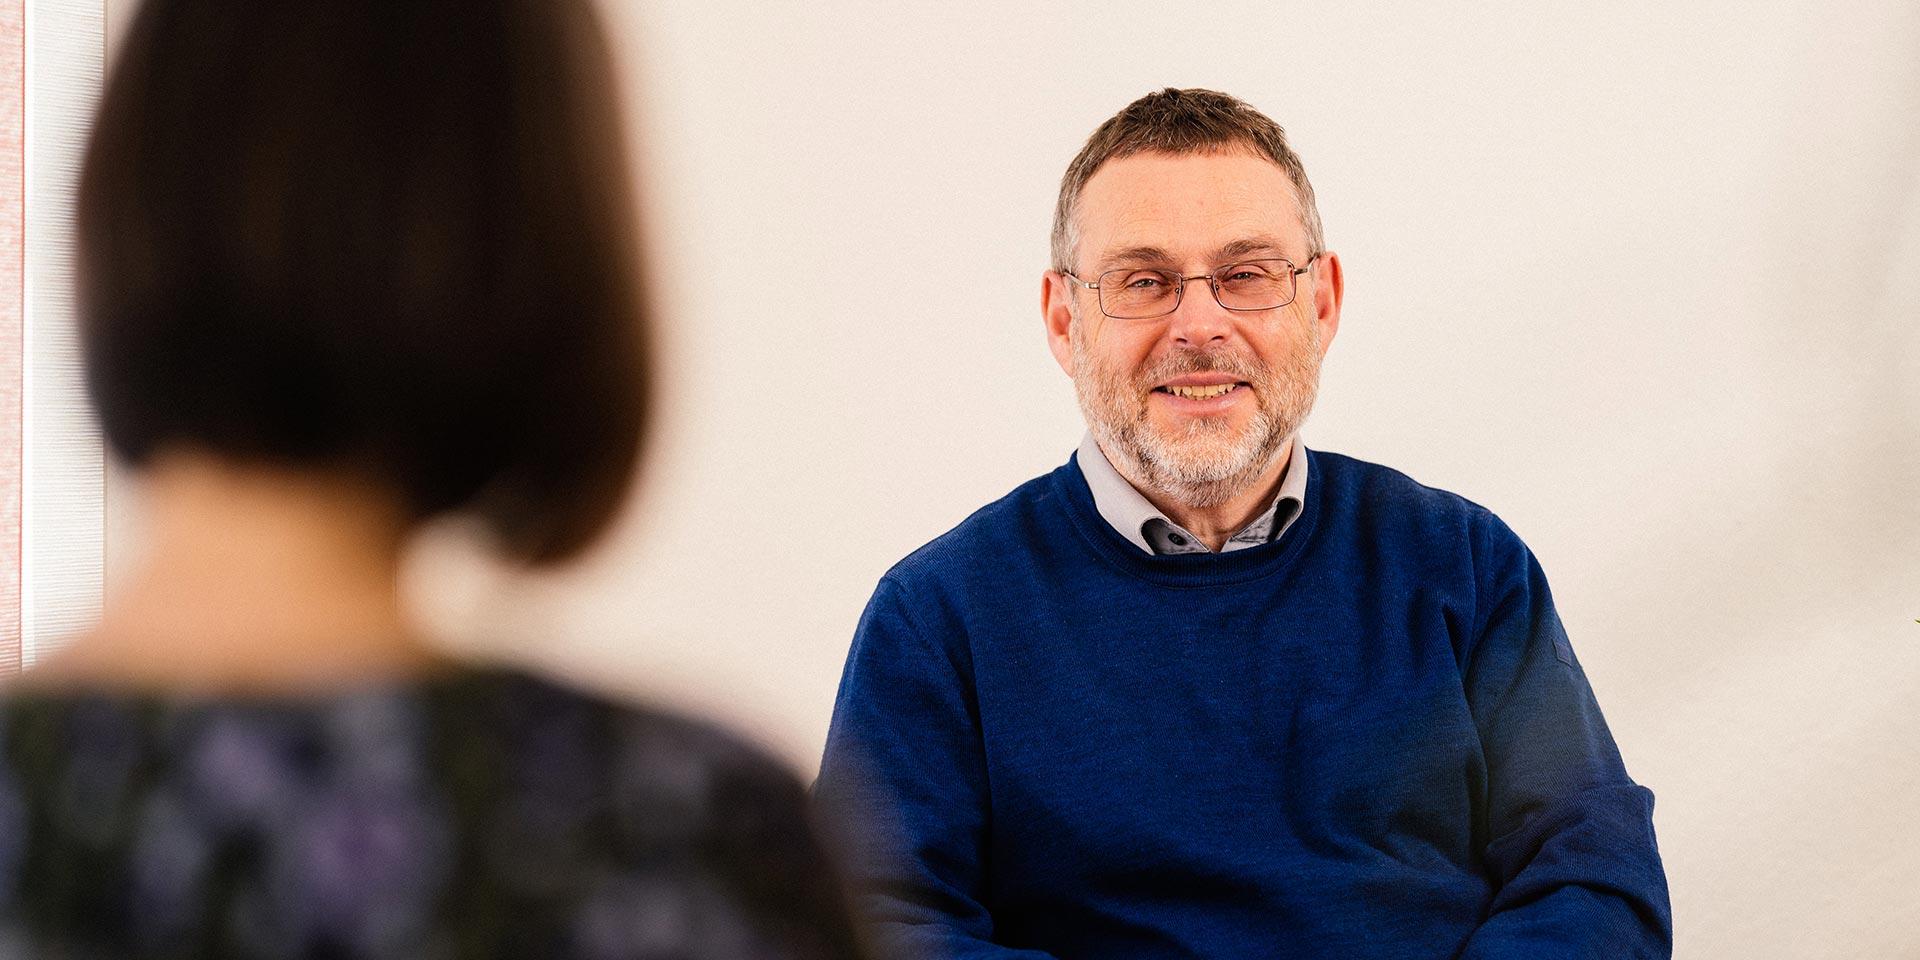 psychotherapie-piroth-andernach-beratung-myk